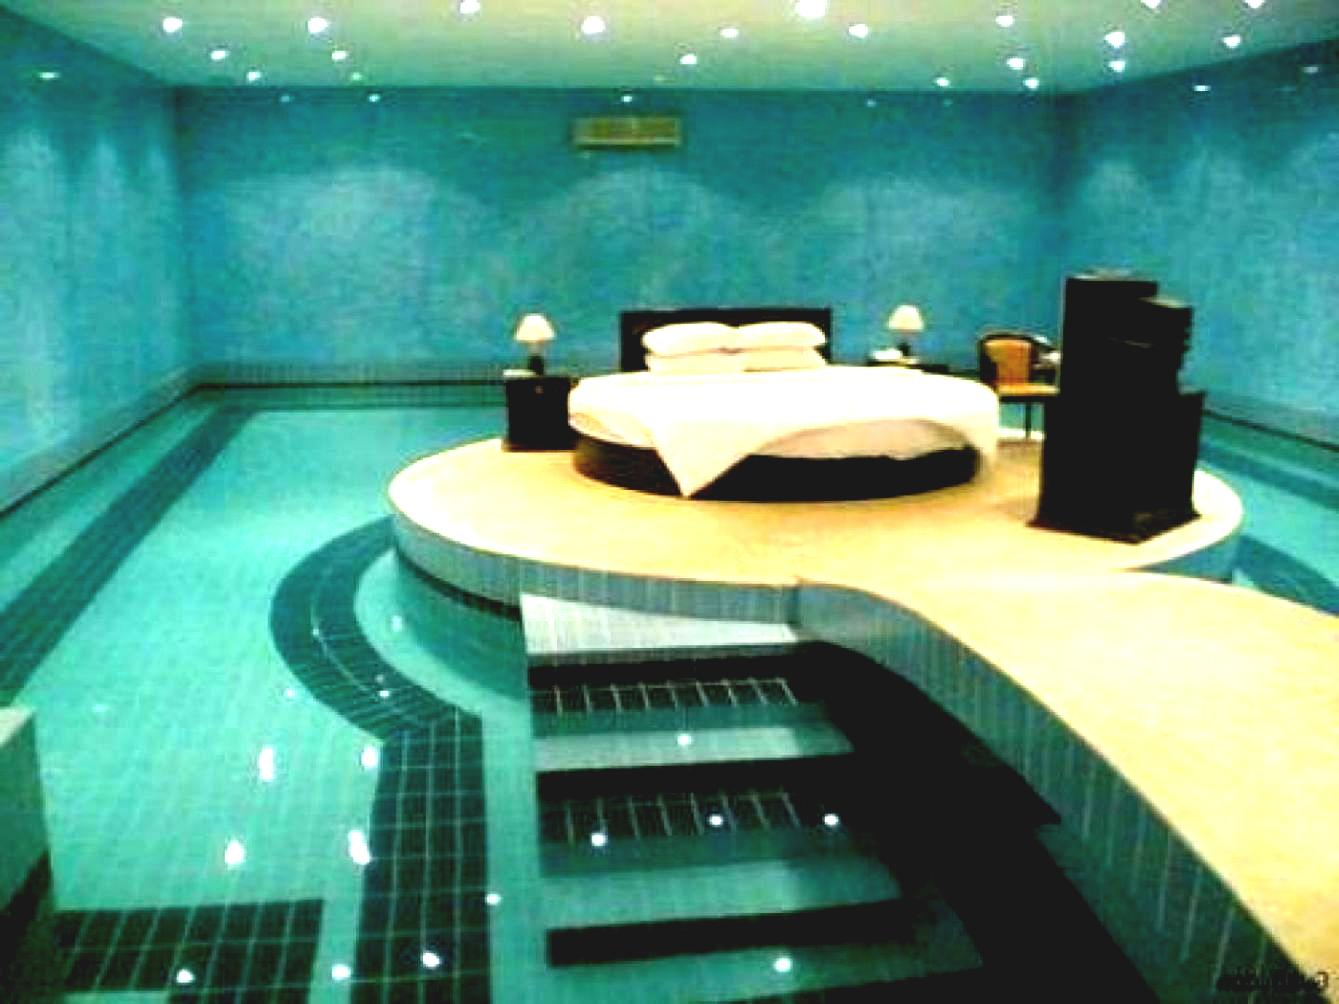 20 chambres incroyables qui font rever la liste. Black Bedroom Furniture Sets. Home Design Ideas